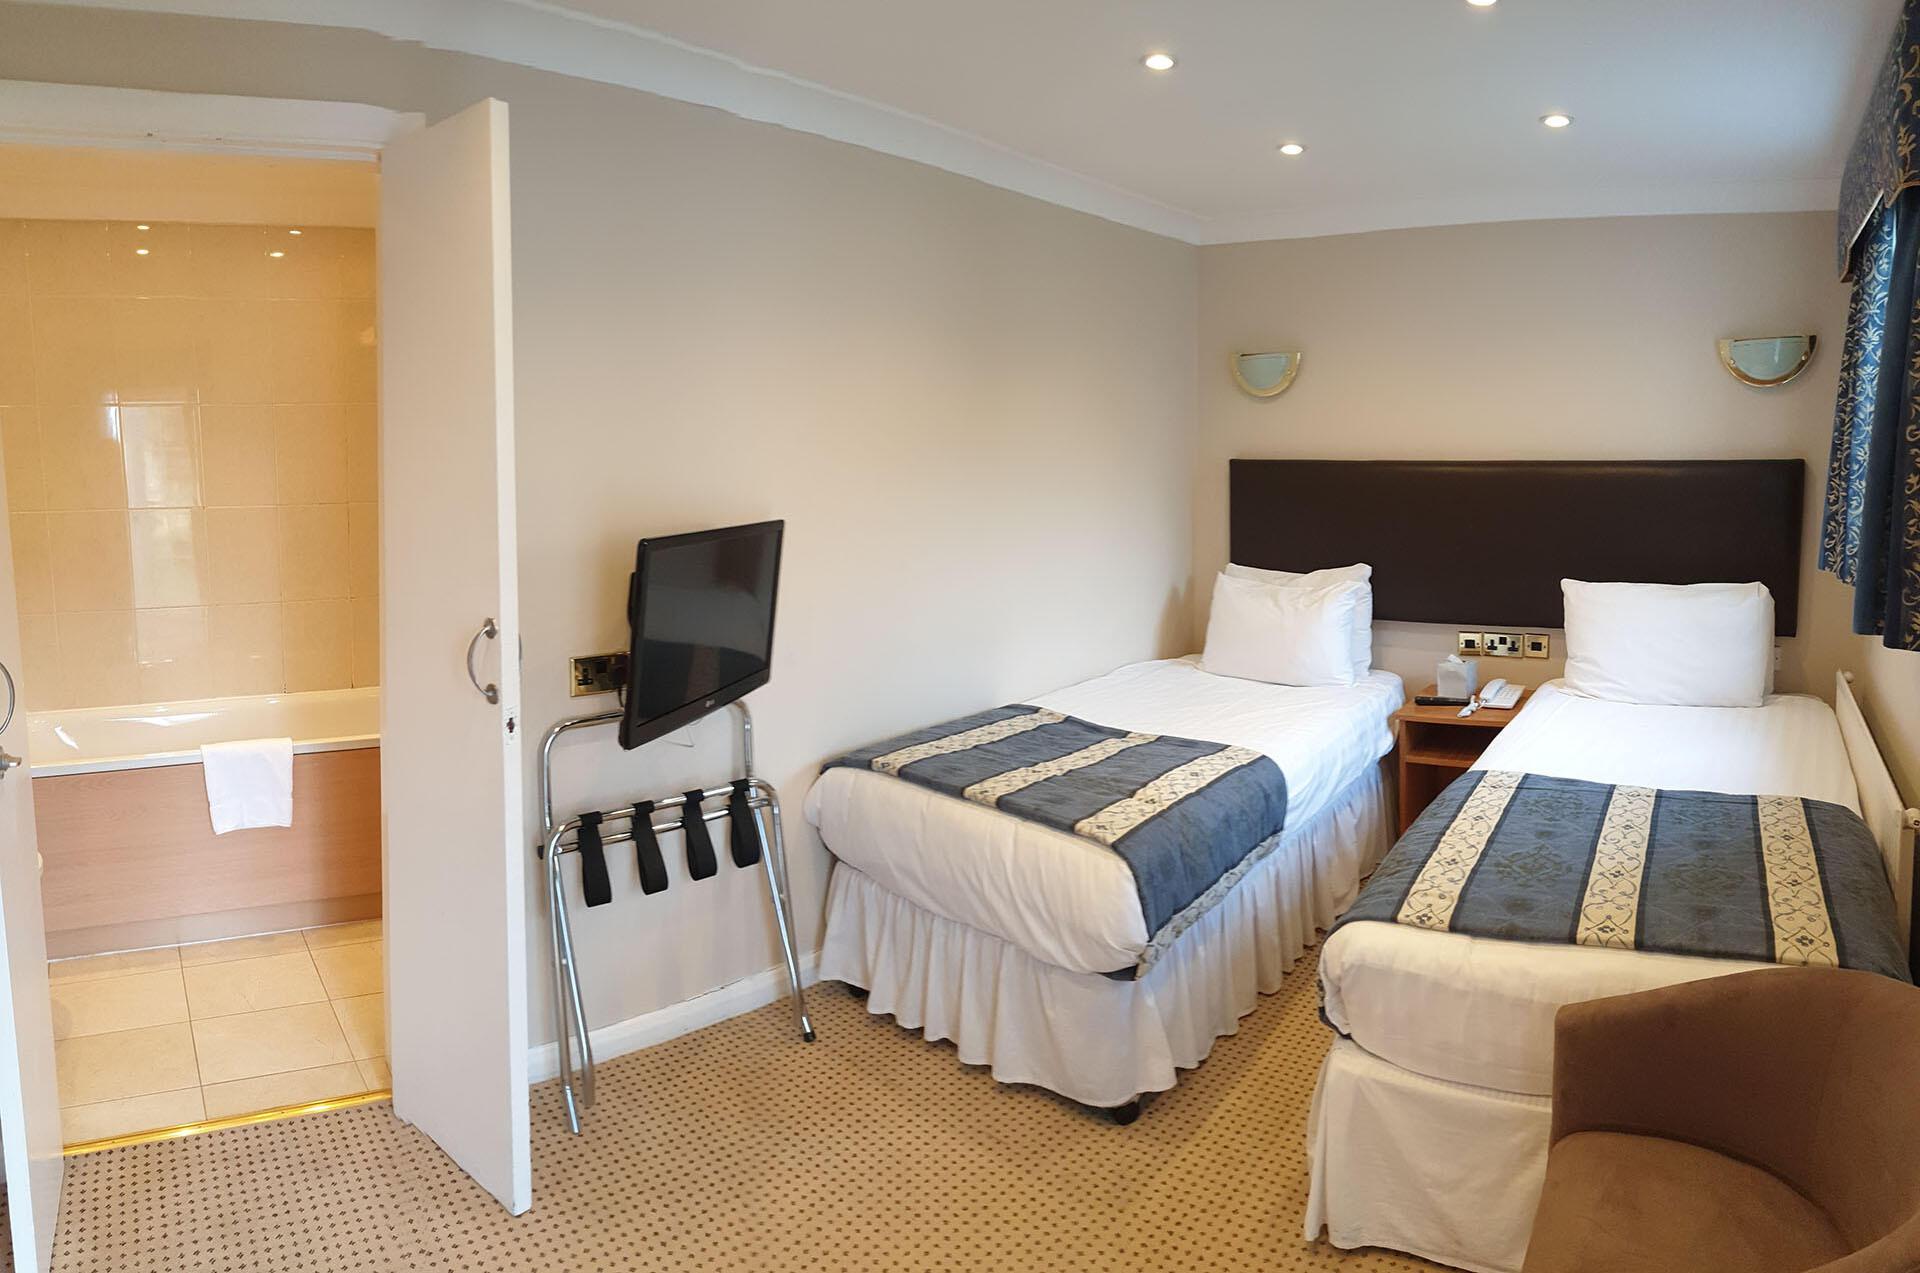 Standard Twin Room at The Barn Hotel, Ruislip